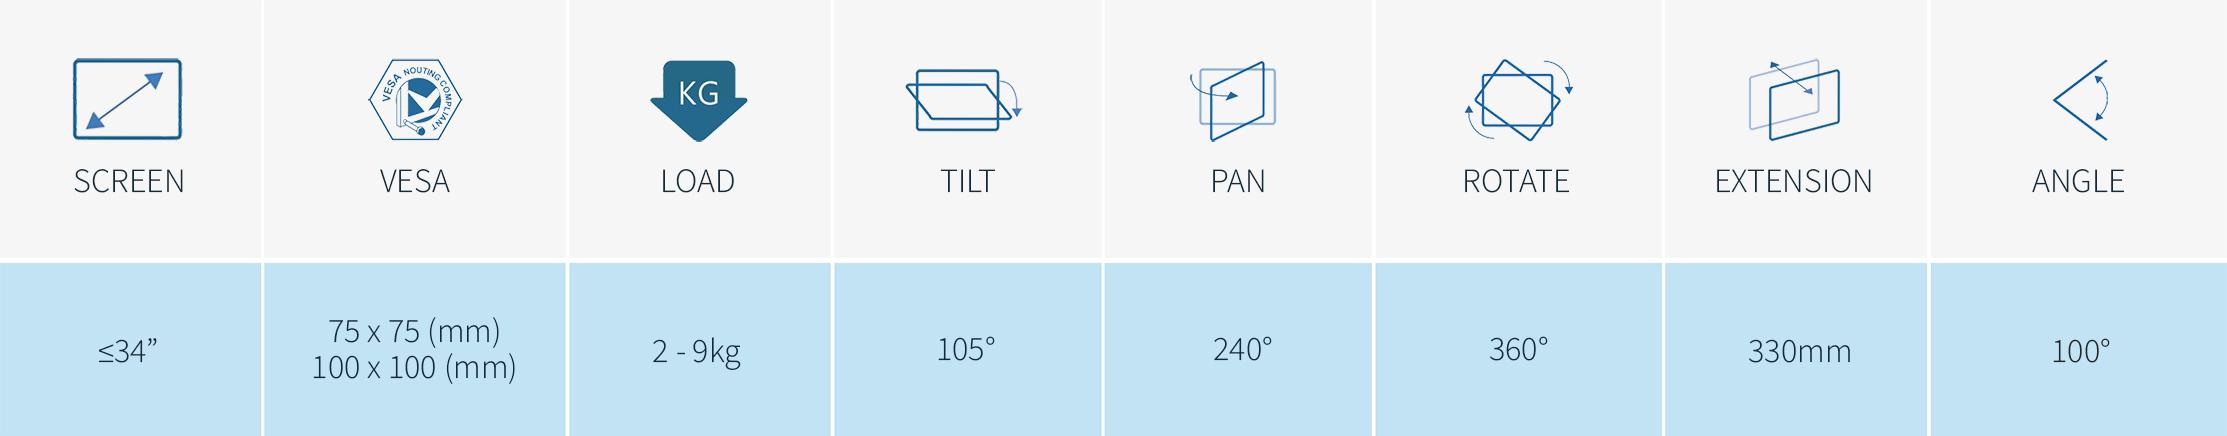 Infinite Monitor Arm MR140 Icon Specs